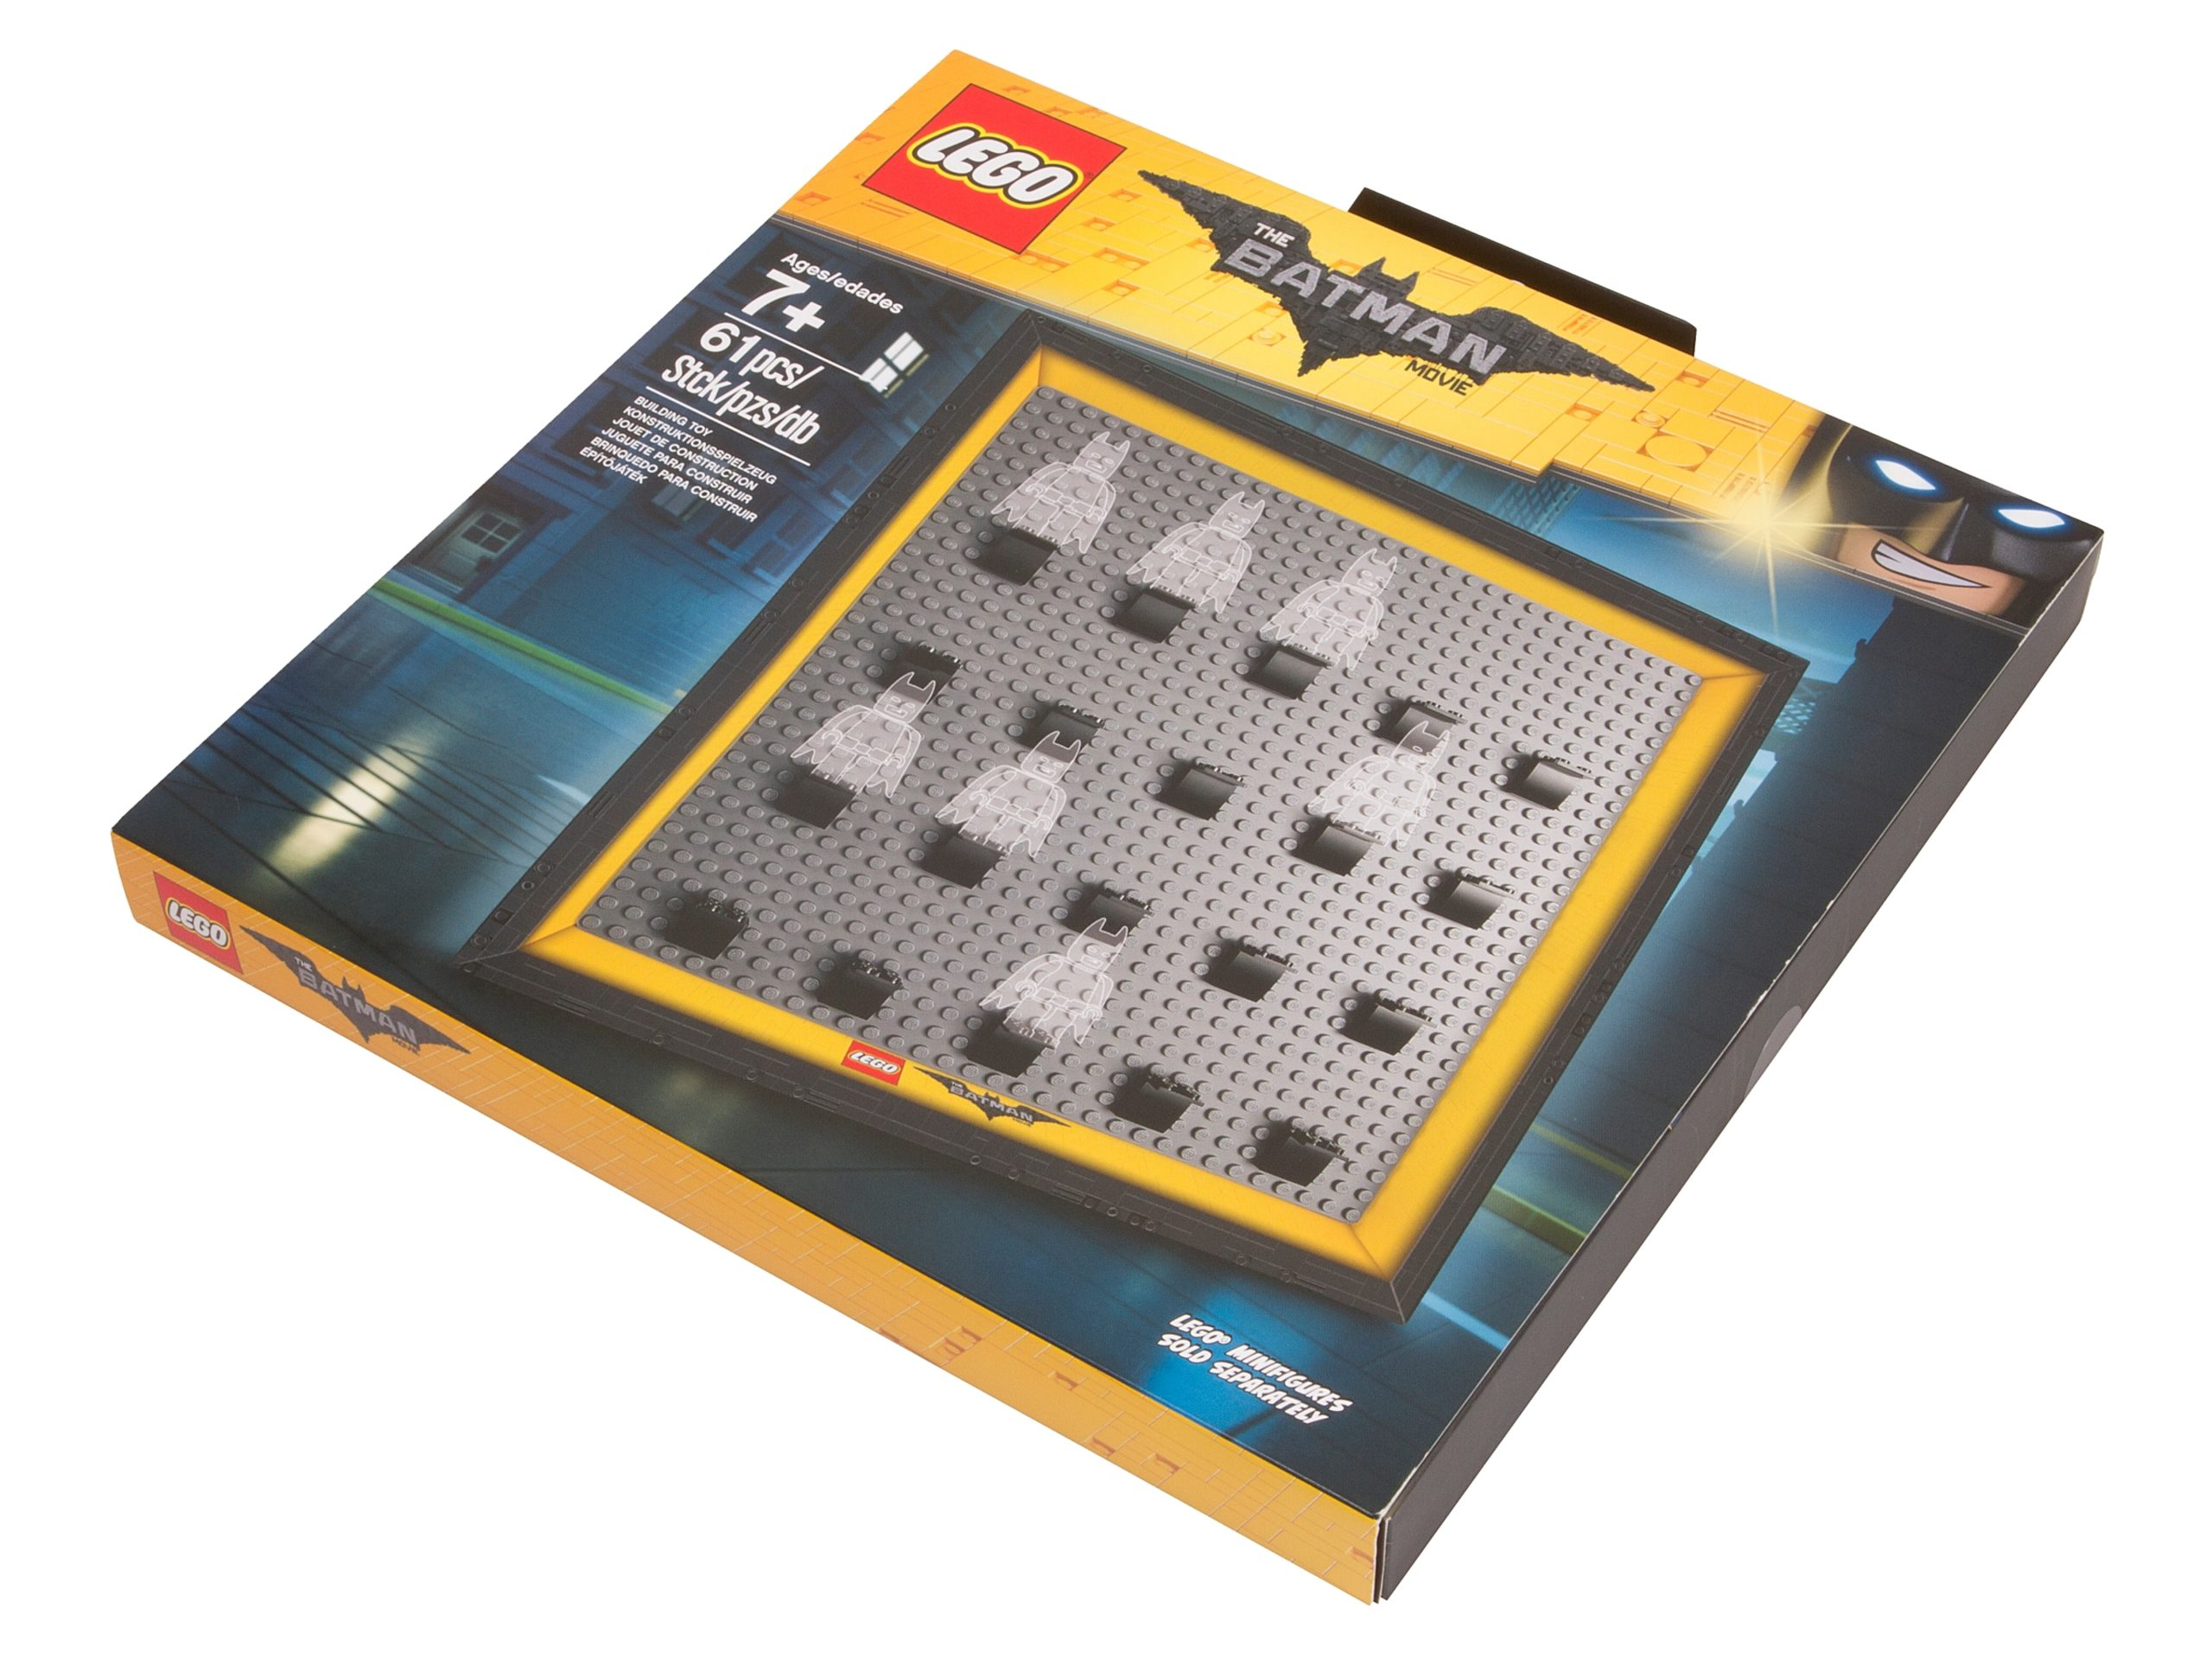 lego 853638 batman movie batman minifigure collector frame scaled